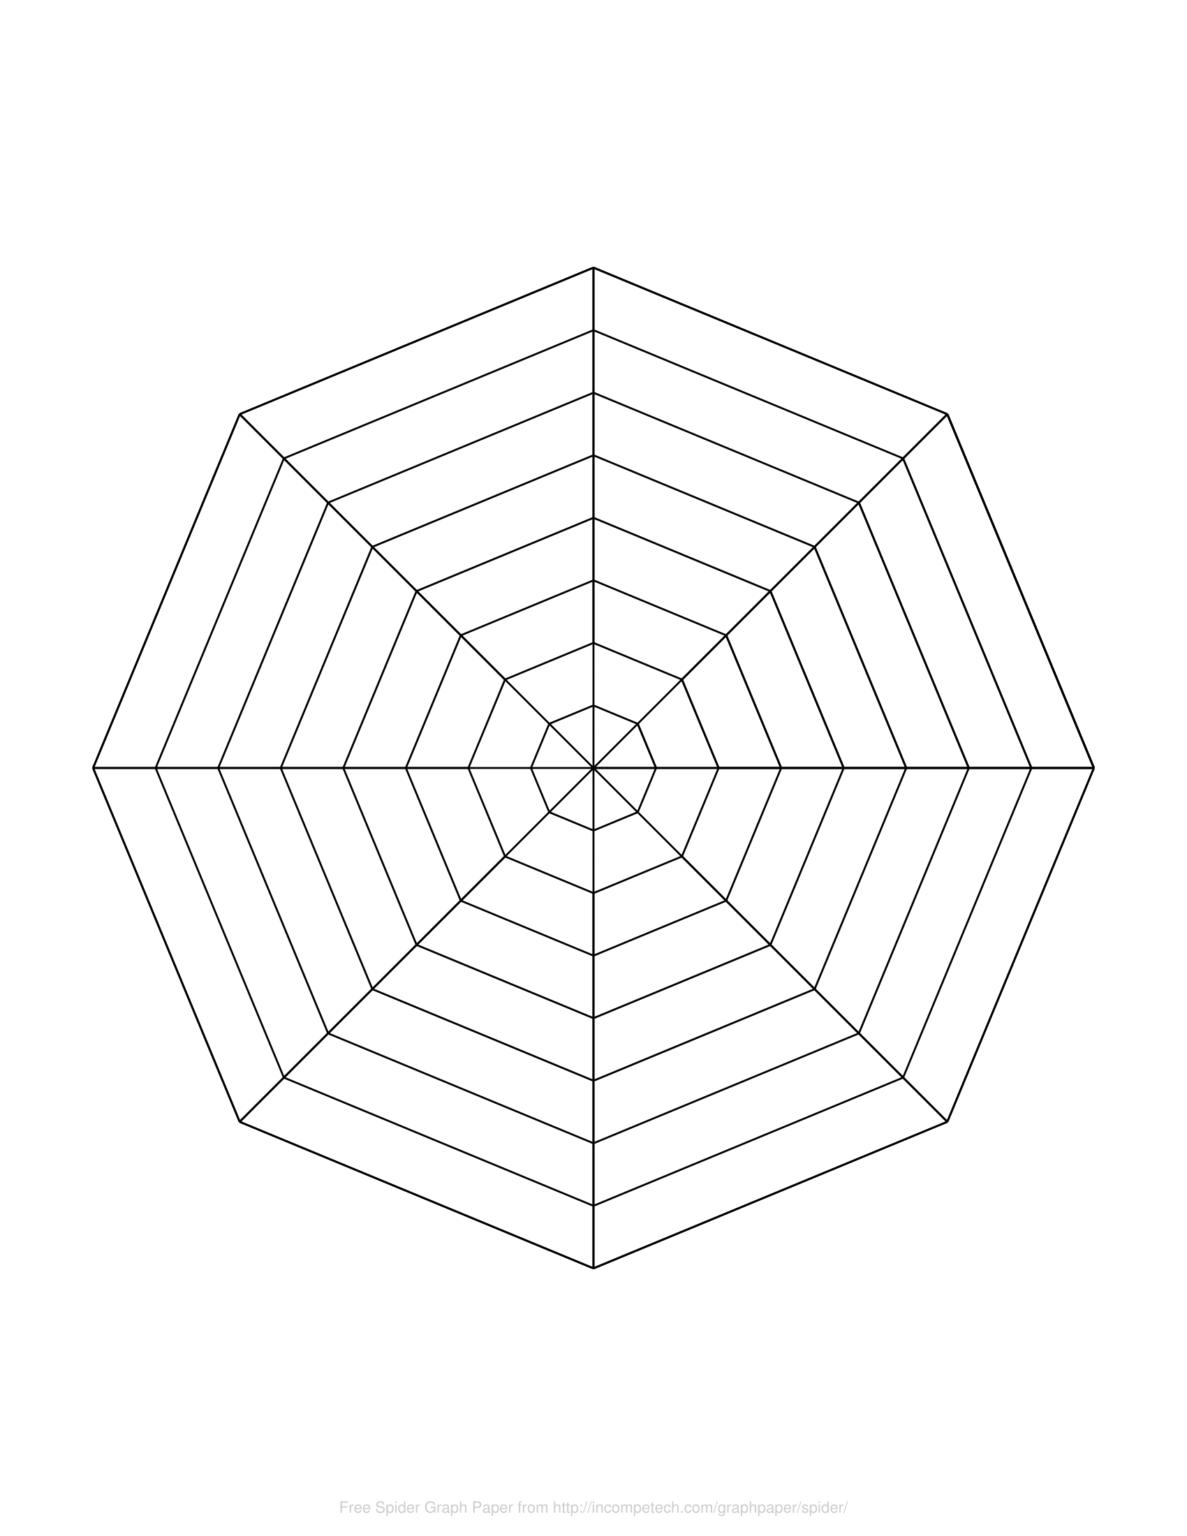 Free Online Graph Paper / Spider in Blank Radar Chart